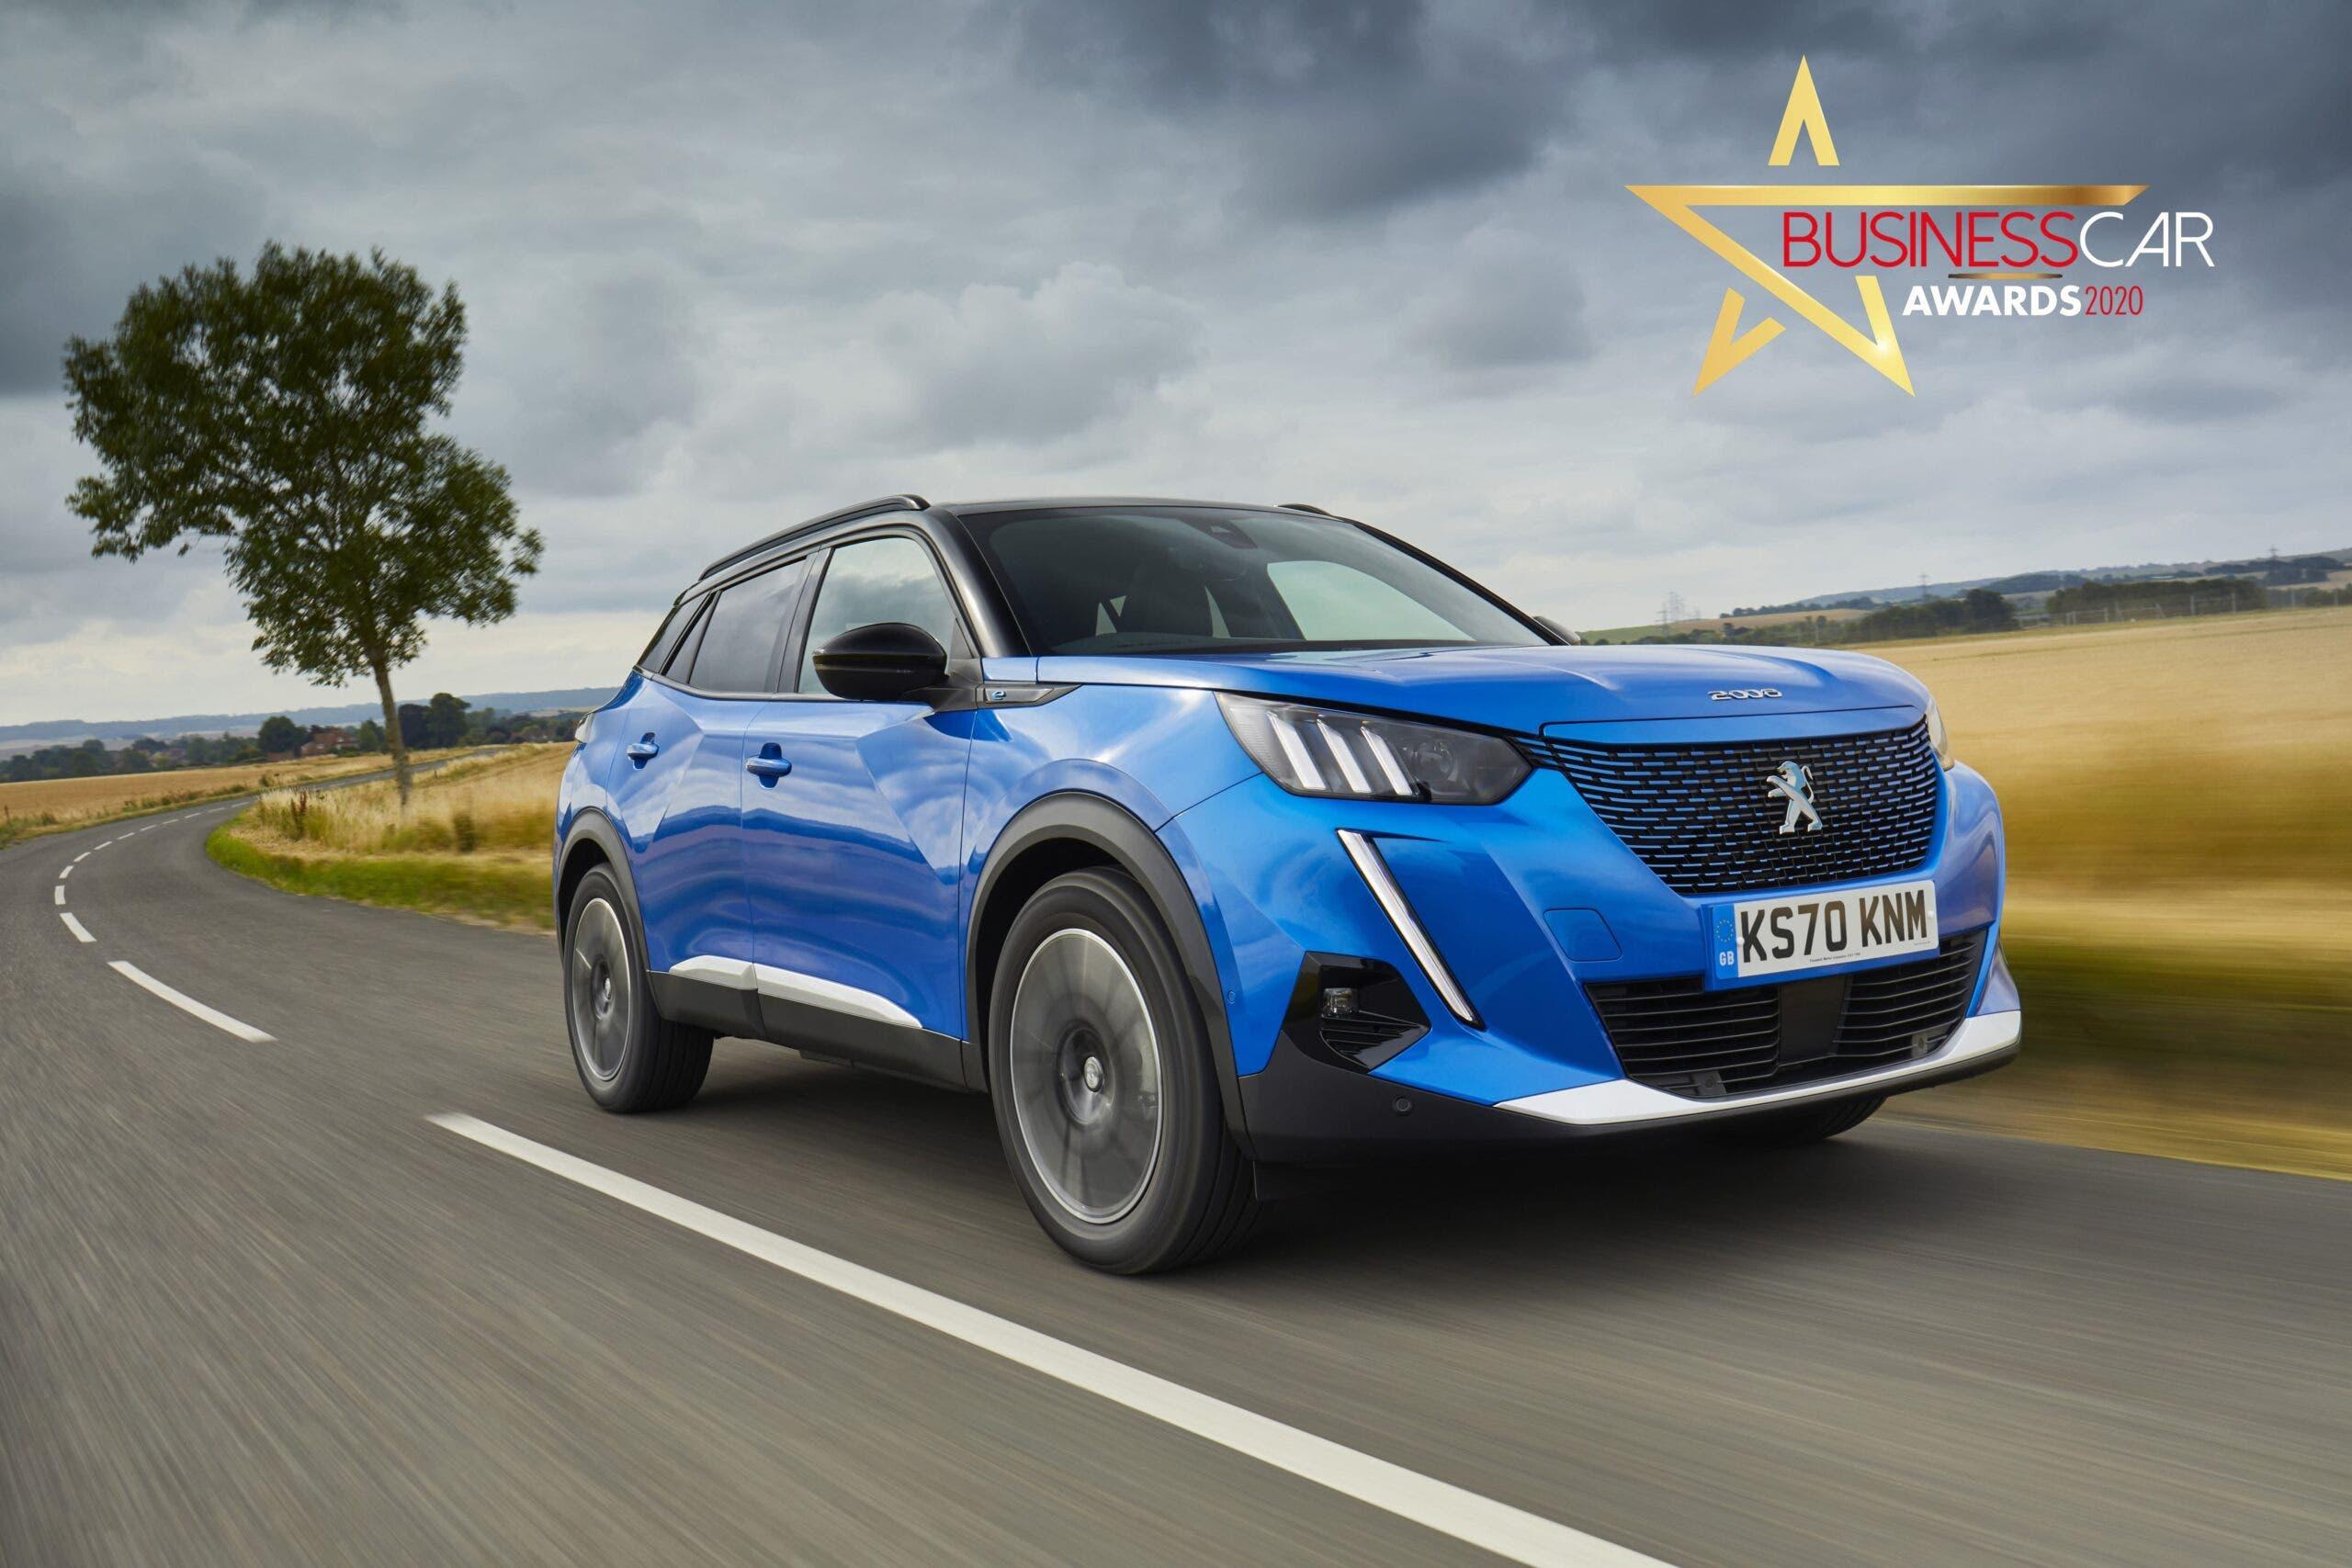 Nuova Peugeot e-2008 Business Car Awards